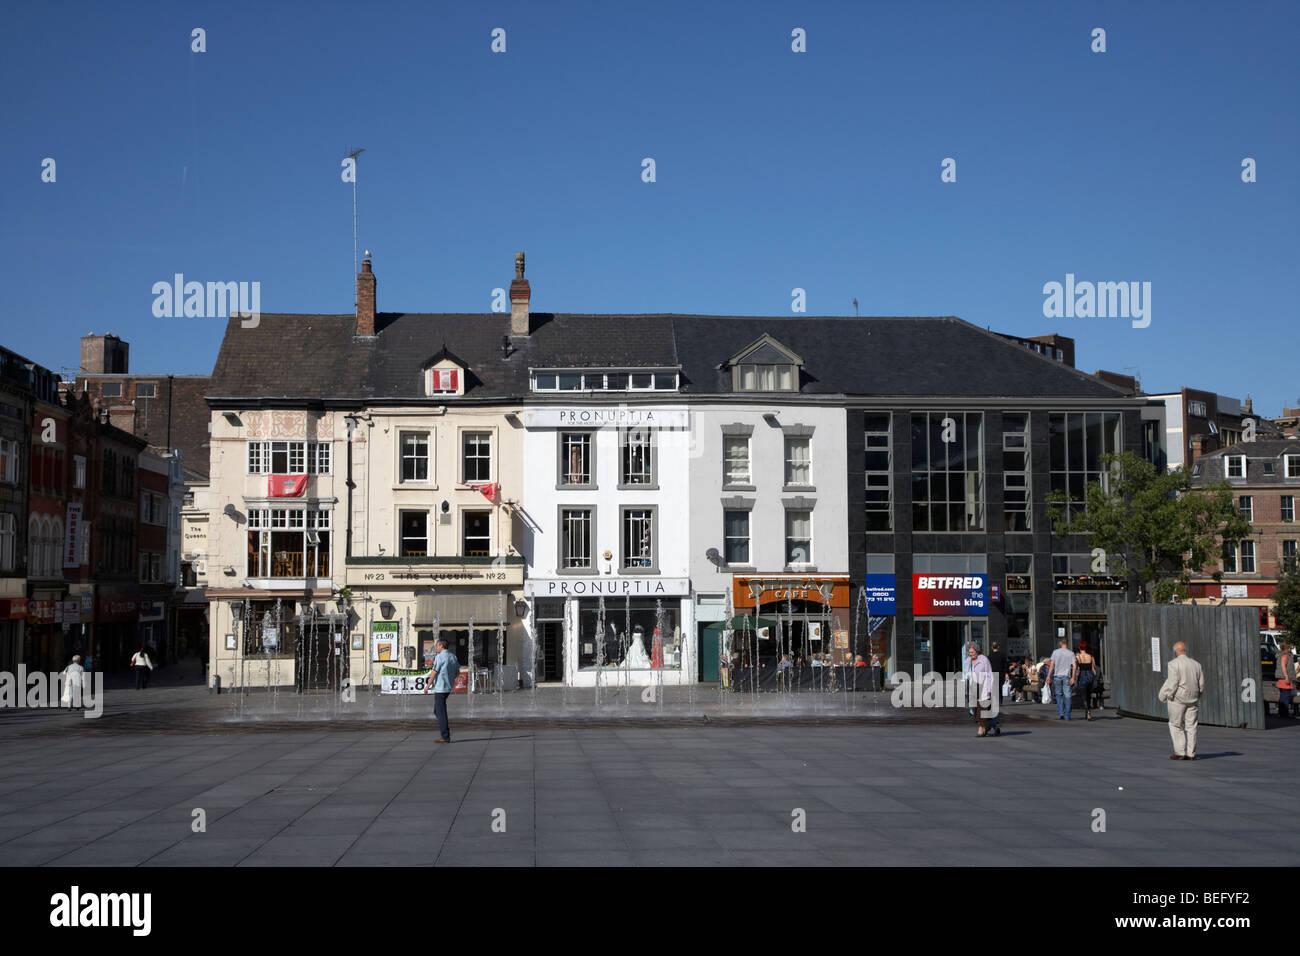 williamson square in liverpool city centre liverpool merseyside england uk Stock Photo